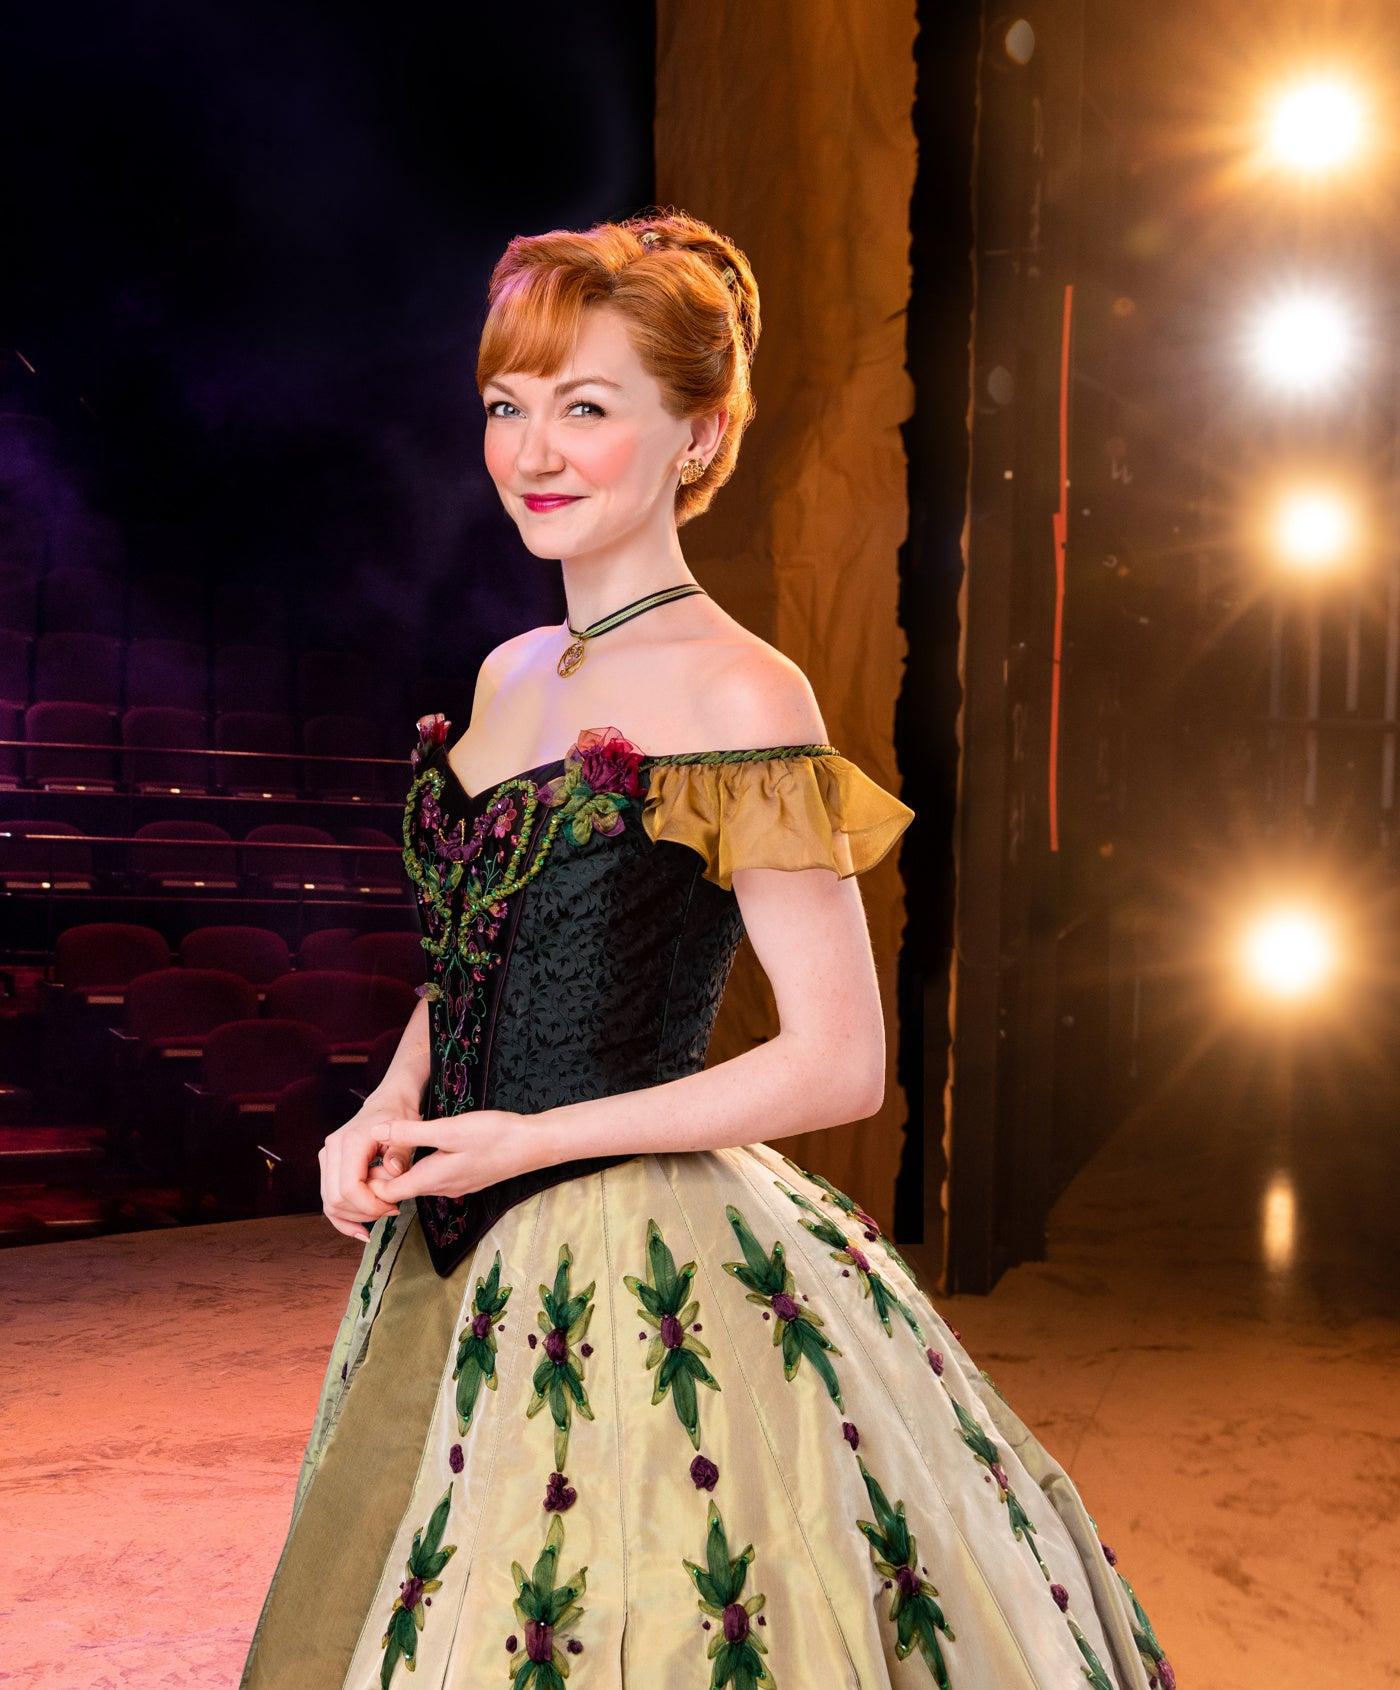 See Caroline Bowman Amp Caroline Innerbichler As Elsa Amp Anna